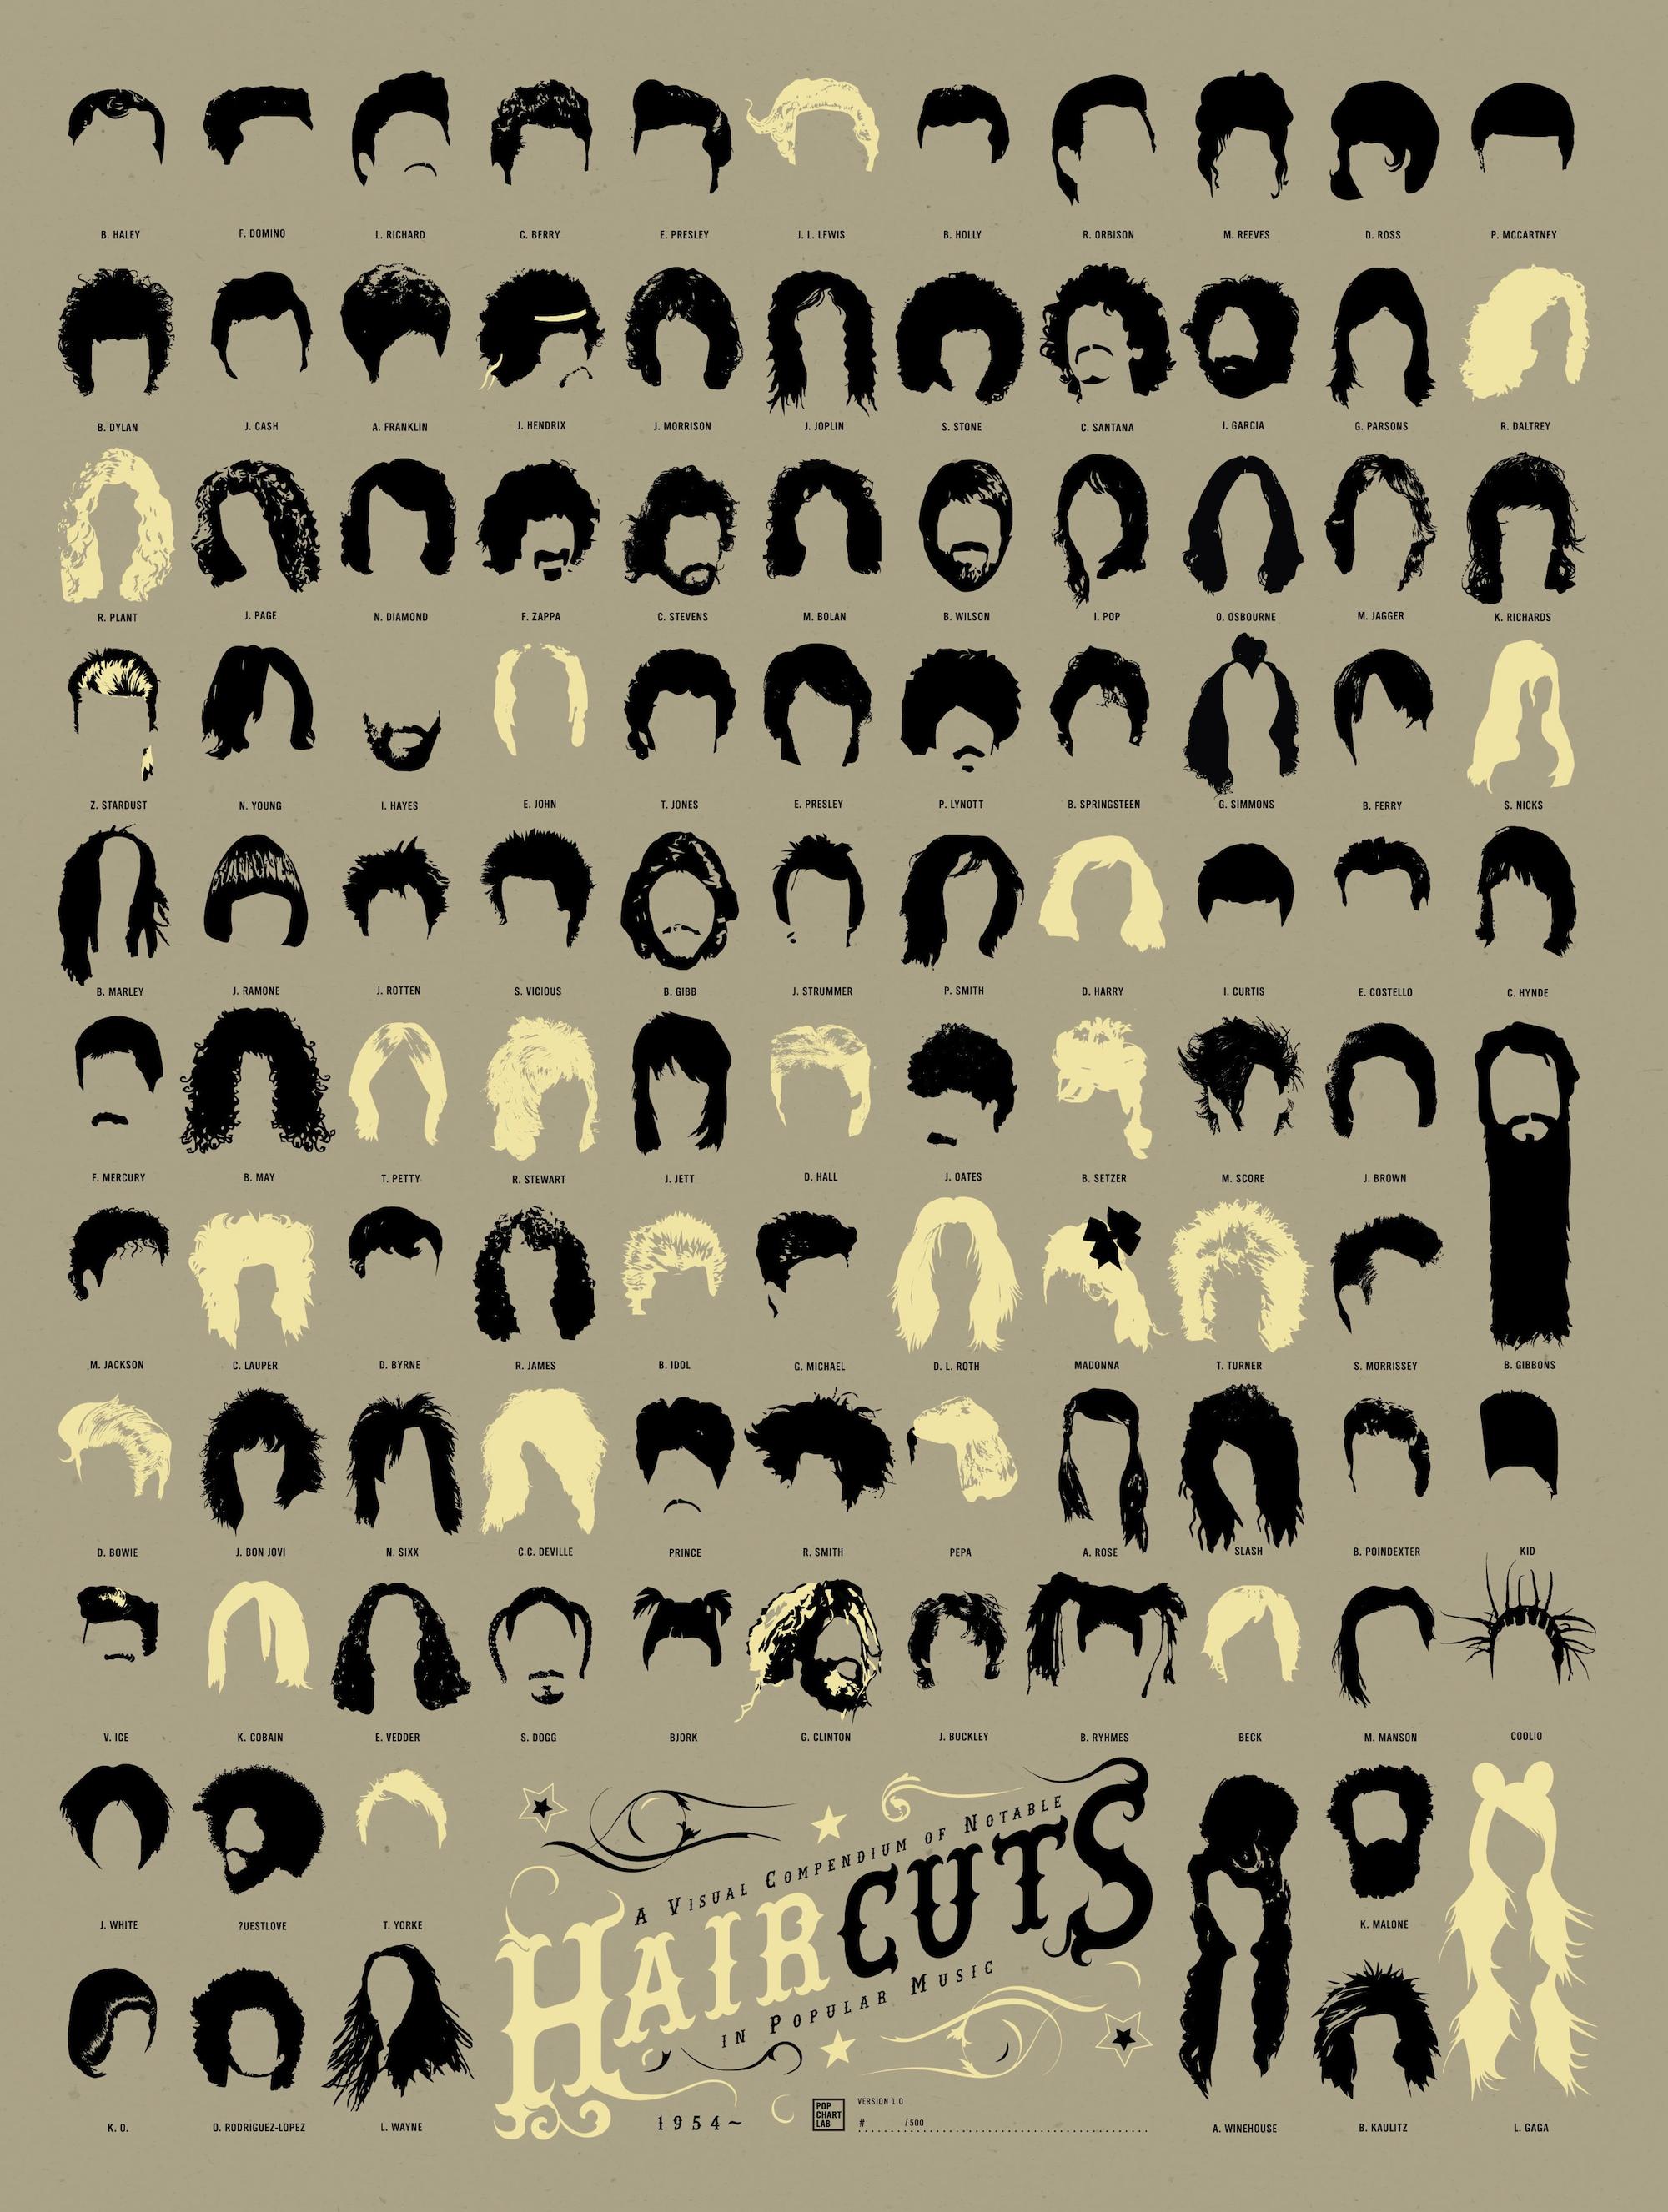 music-hair-cuts-infographic-full